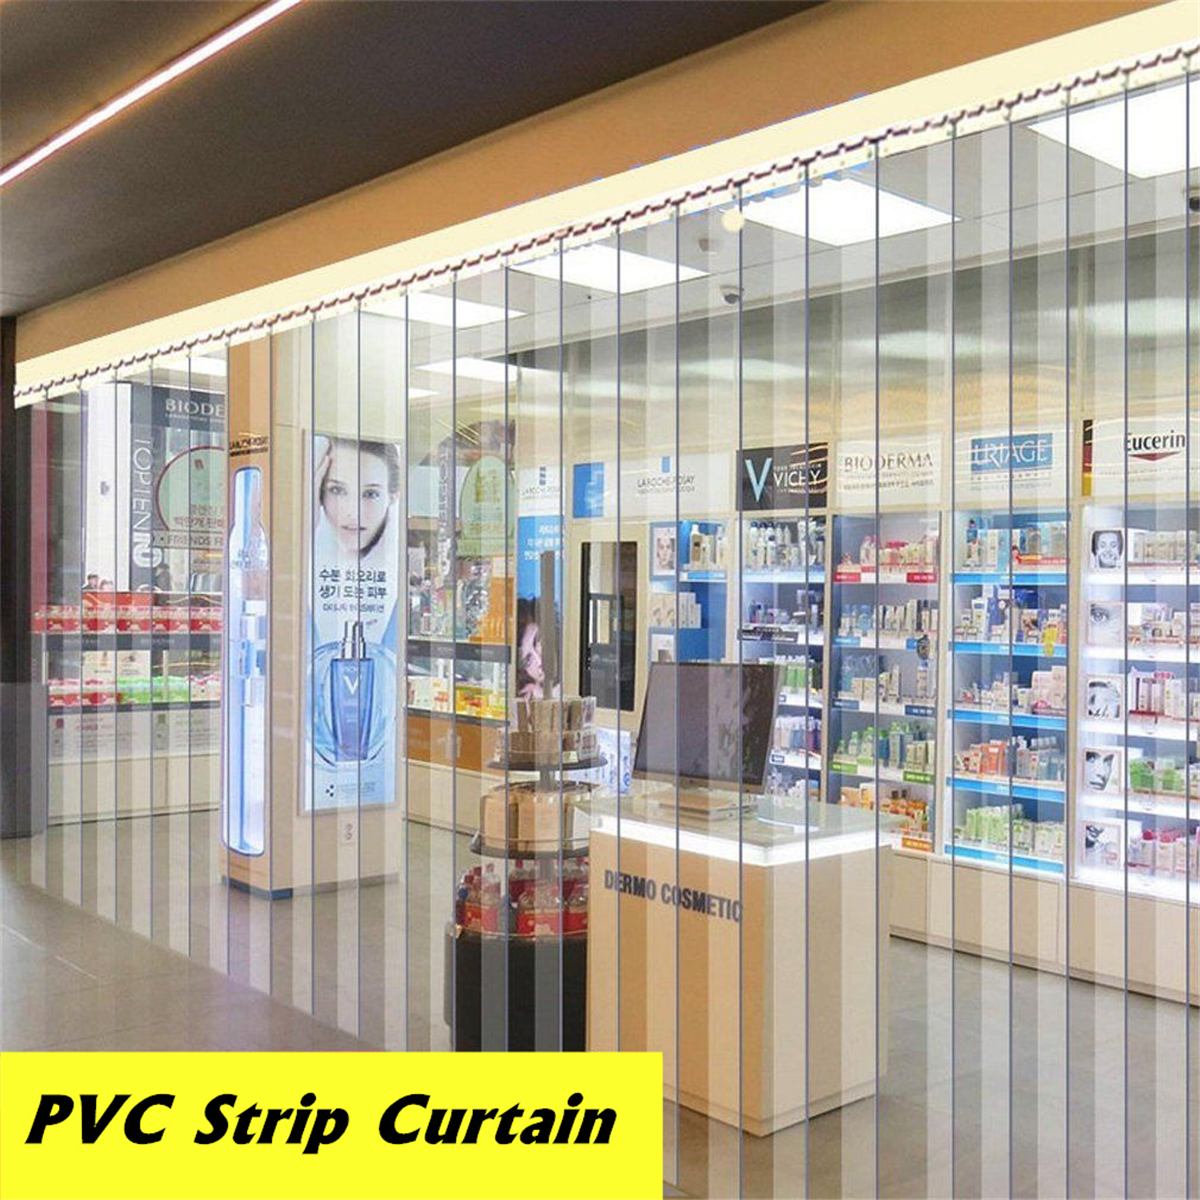 Transparent PVC Plastic Strip Curtain 200*18*0.1cm Freezer Room Door Strip Kit Hanging Rail Curtains Heat Cold Resist Windproof